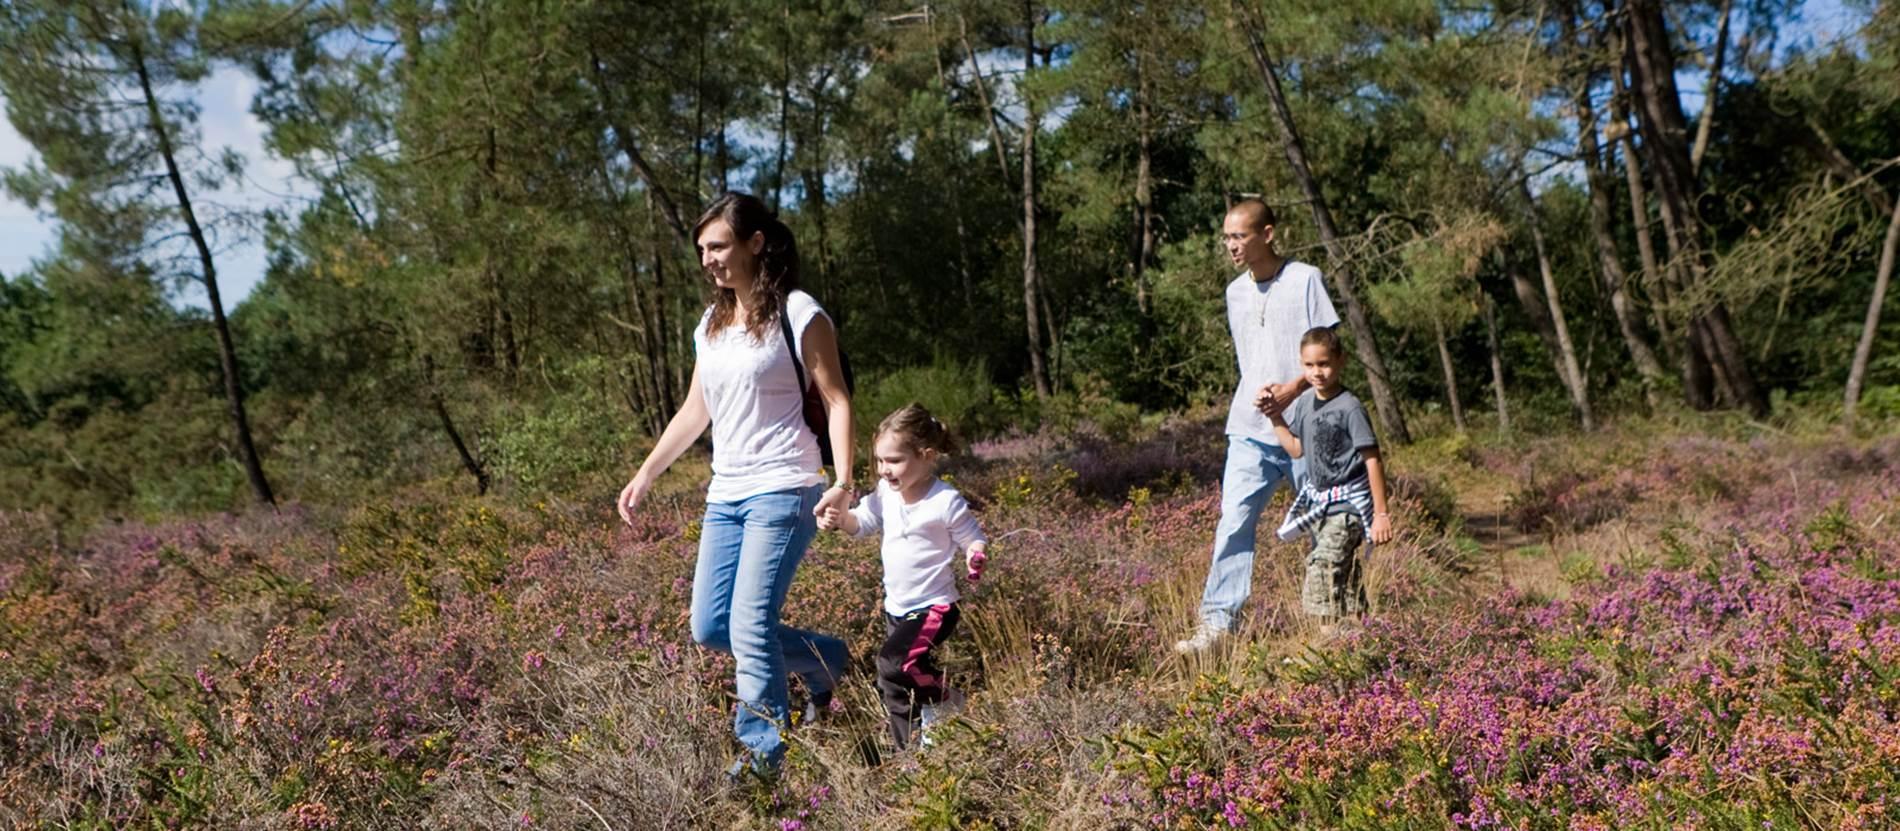 Balade Nature Rochefort en Terre © MorbihanTourisme